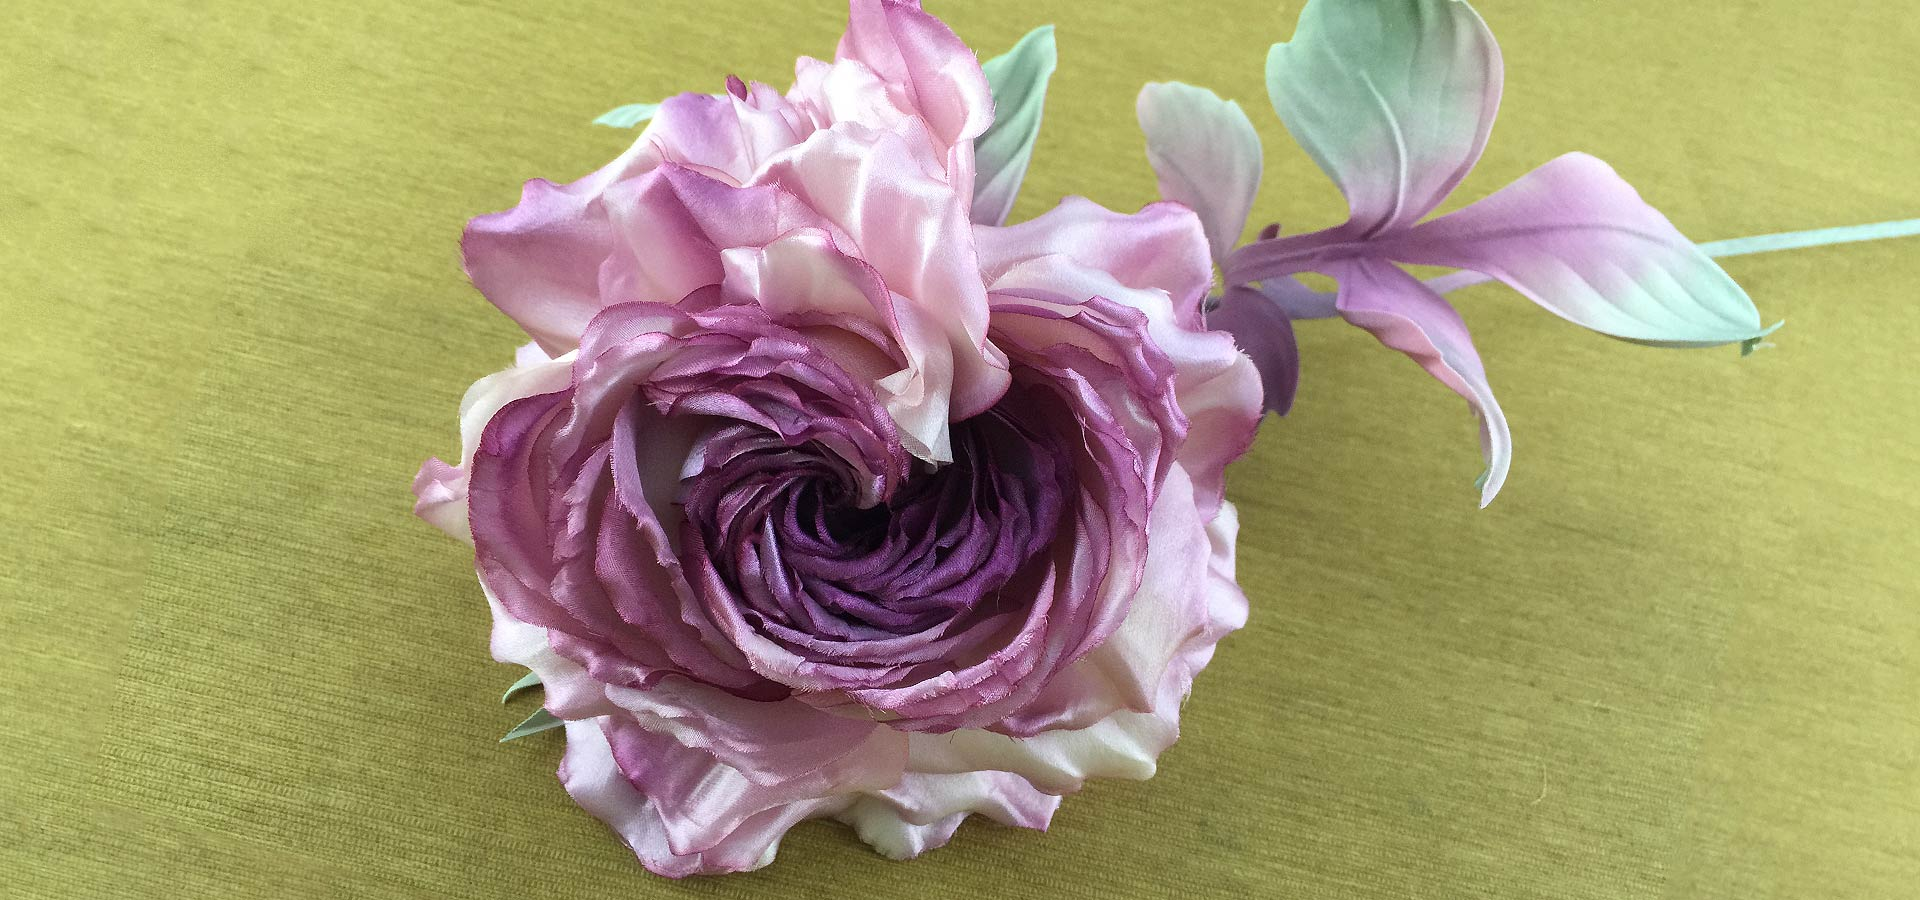 jp2-silk-rose-fioletovaya